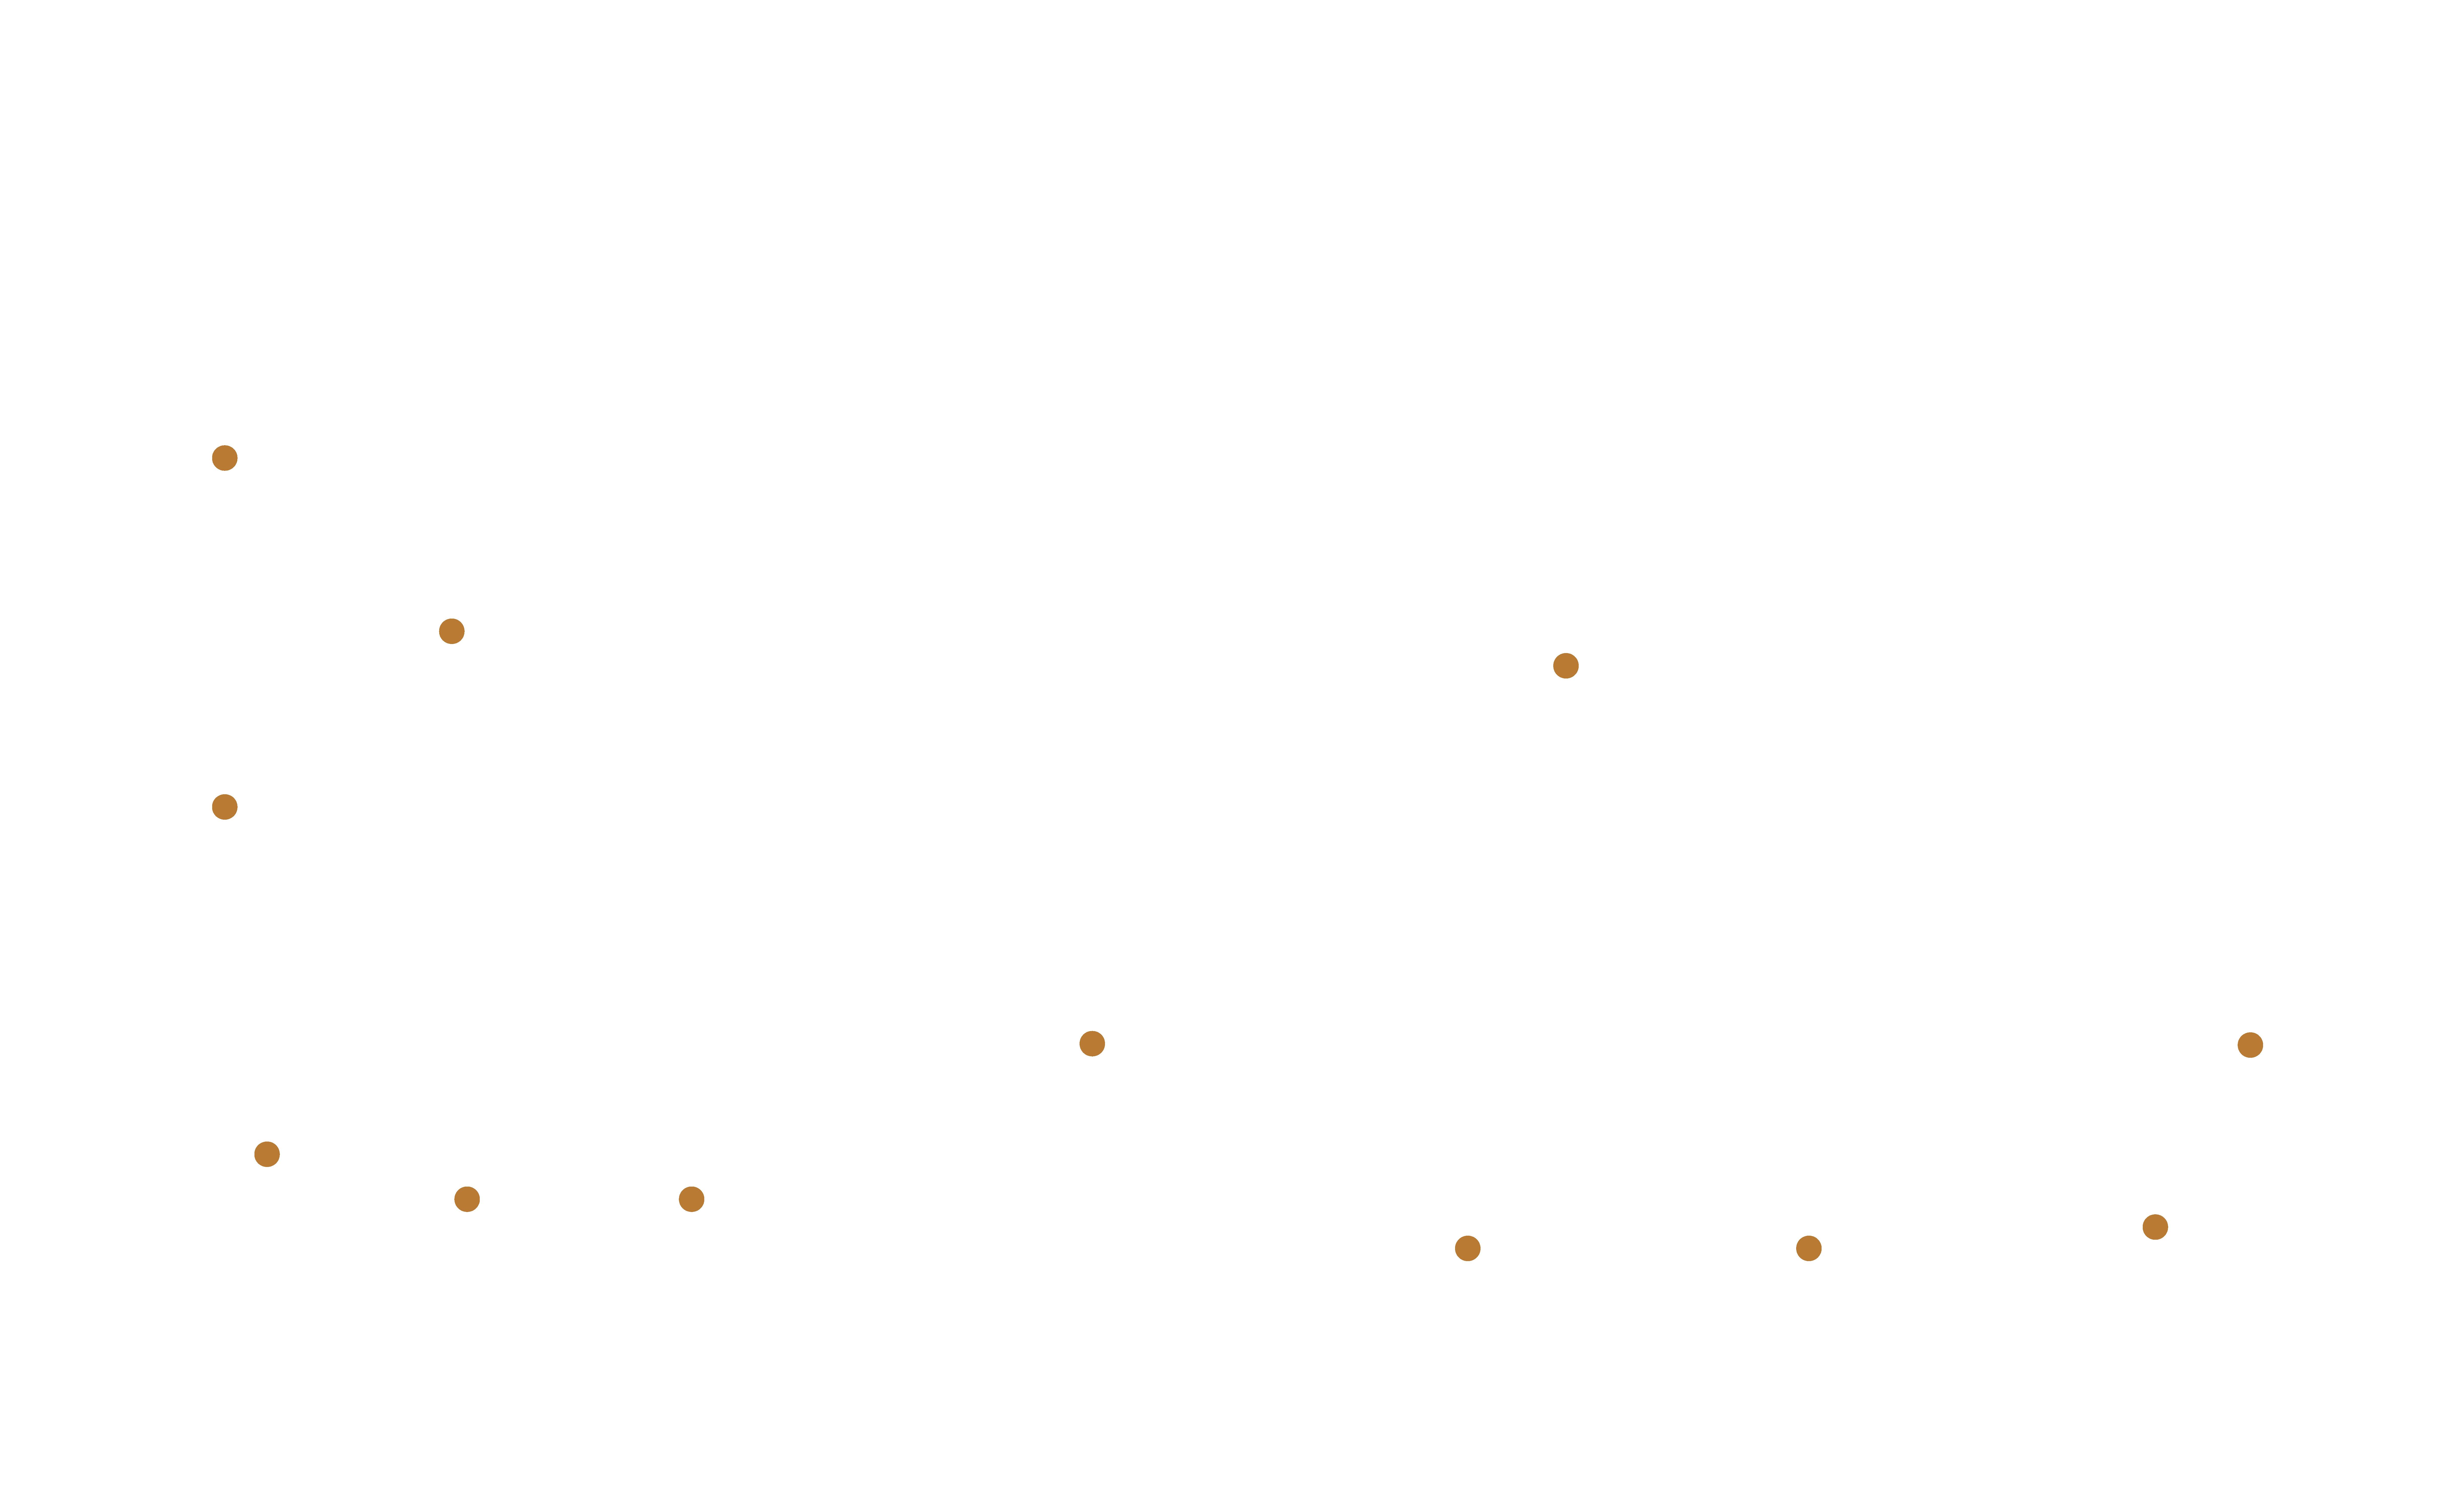 j000344_revelop_wilton-greenbridge-drive-centre-plan_ground-floor